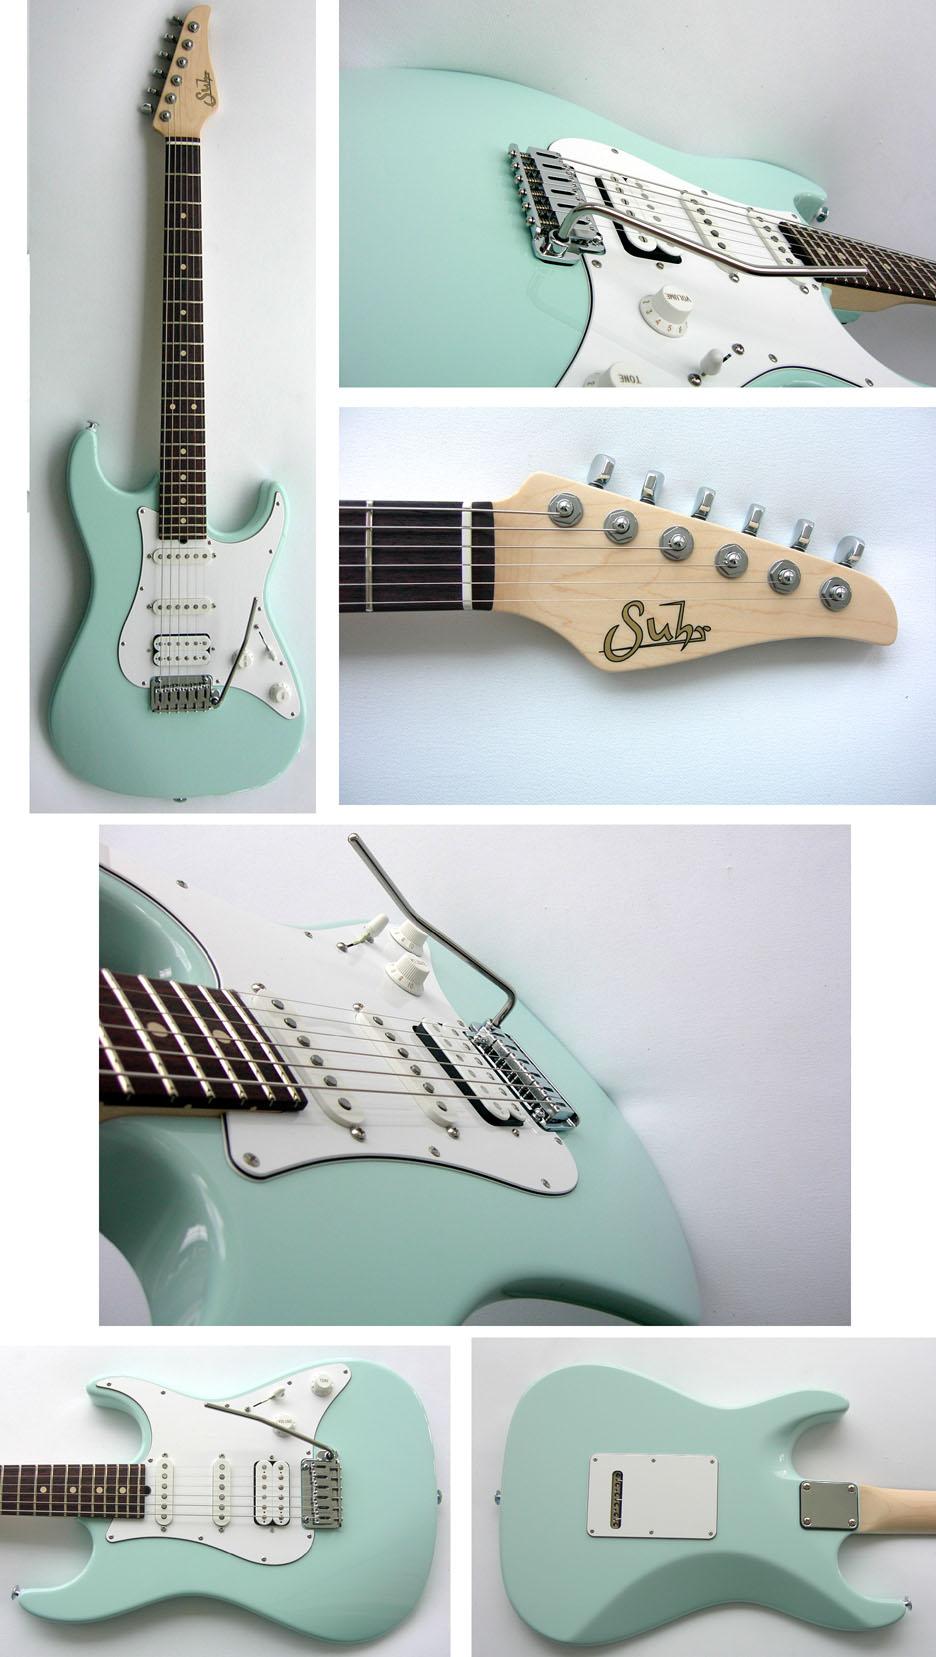 Suhr Standard Pro Series S1 SONIC BLUE